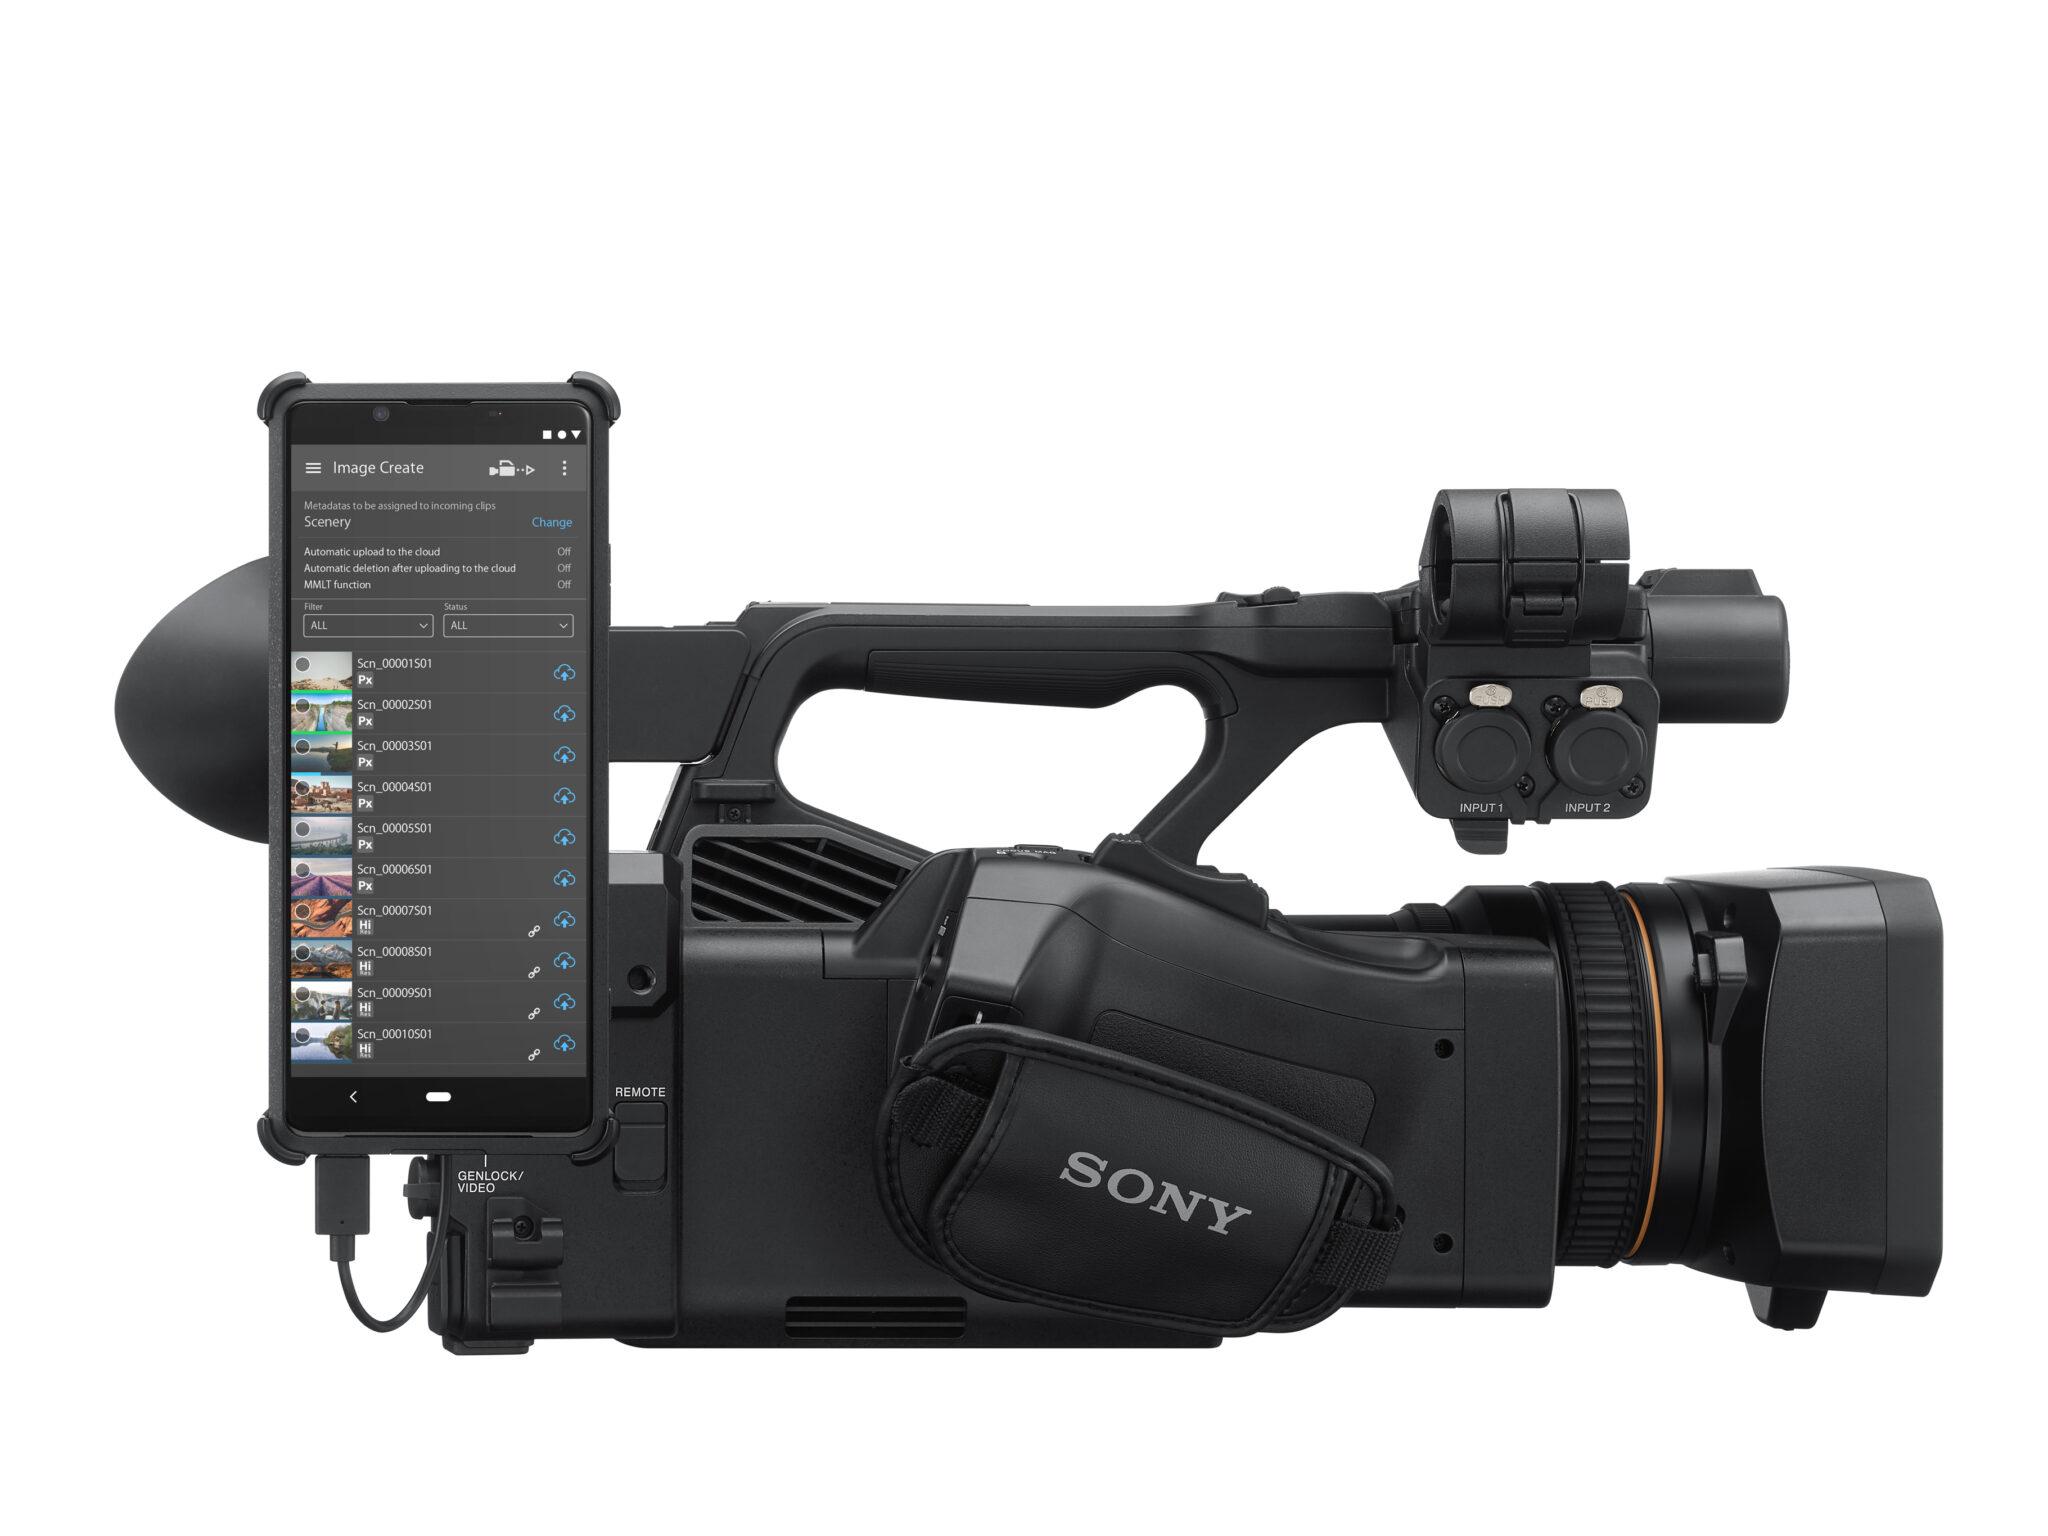 Sony, c3 portal